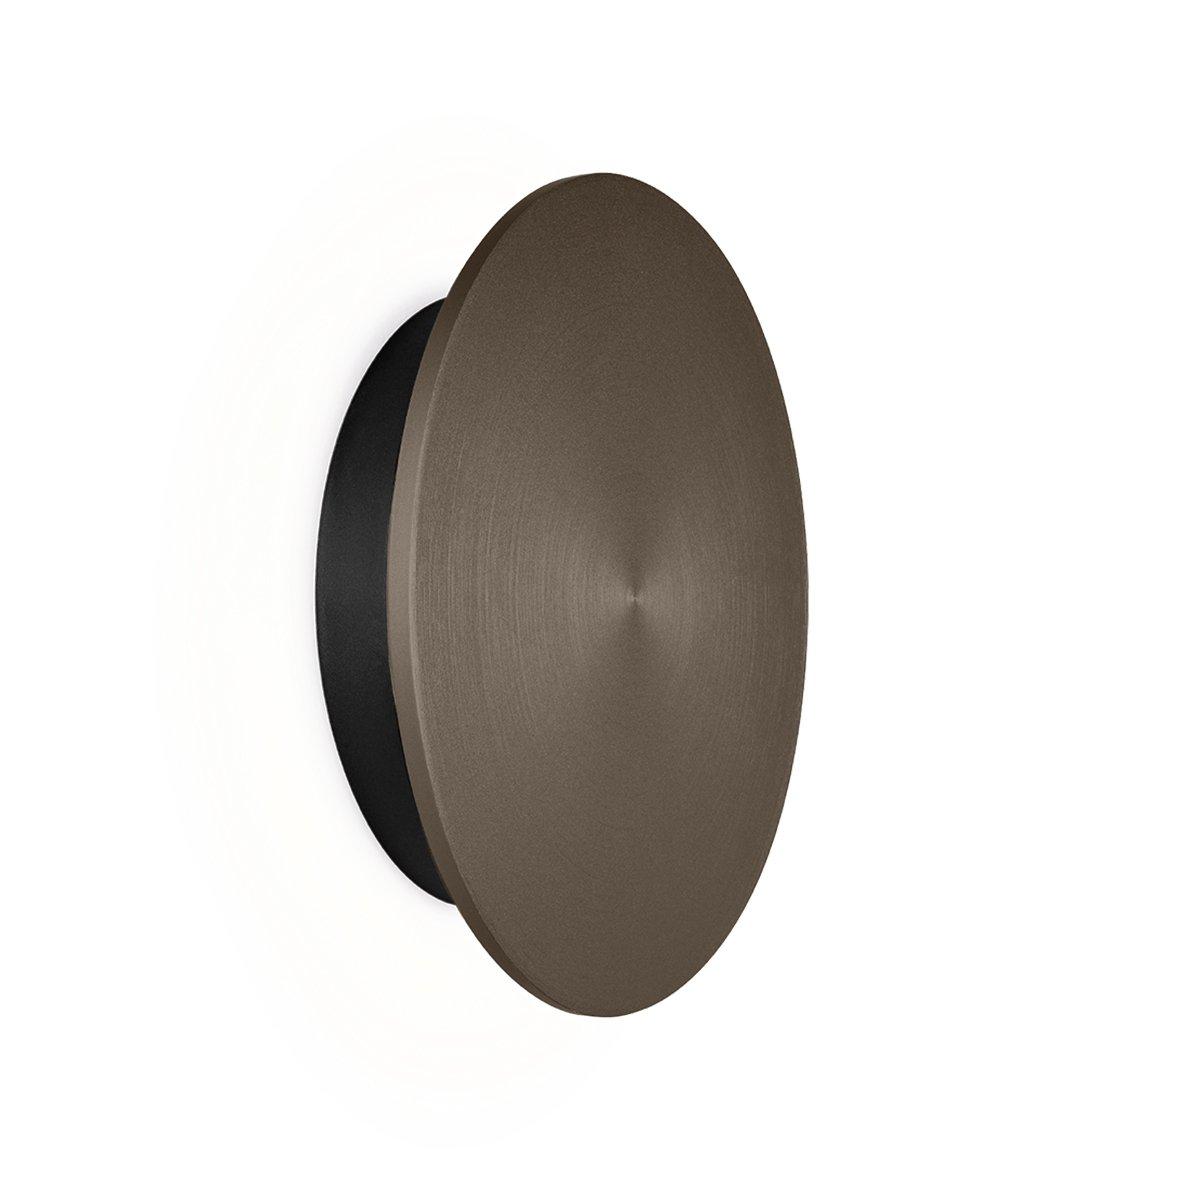 Wever & Ducr� Miles 2.0 Round Wandlamp Brons - 2700 Kelvin